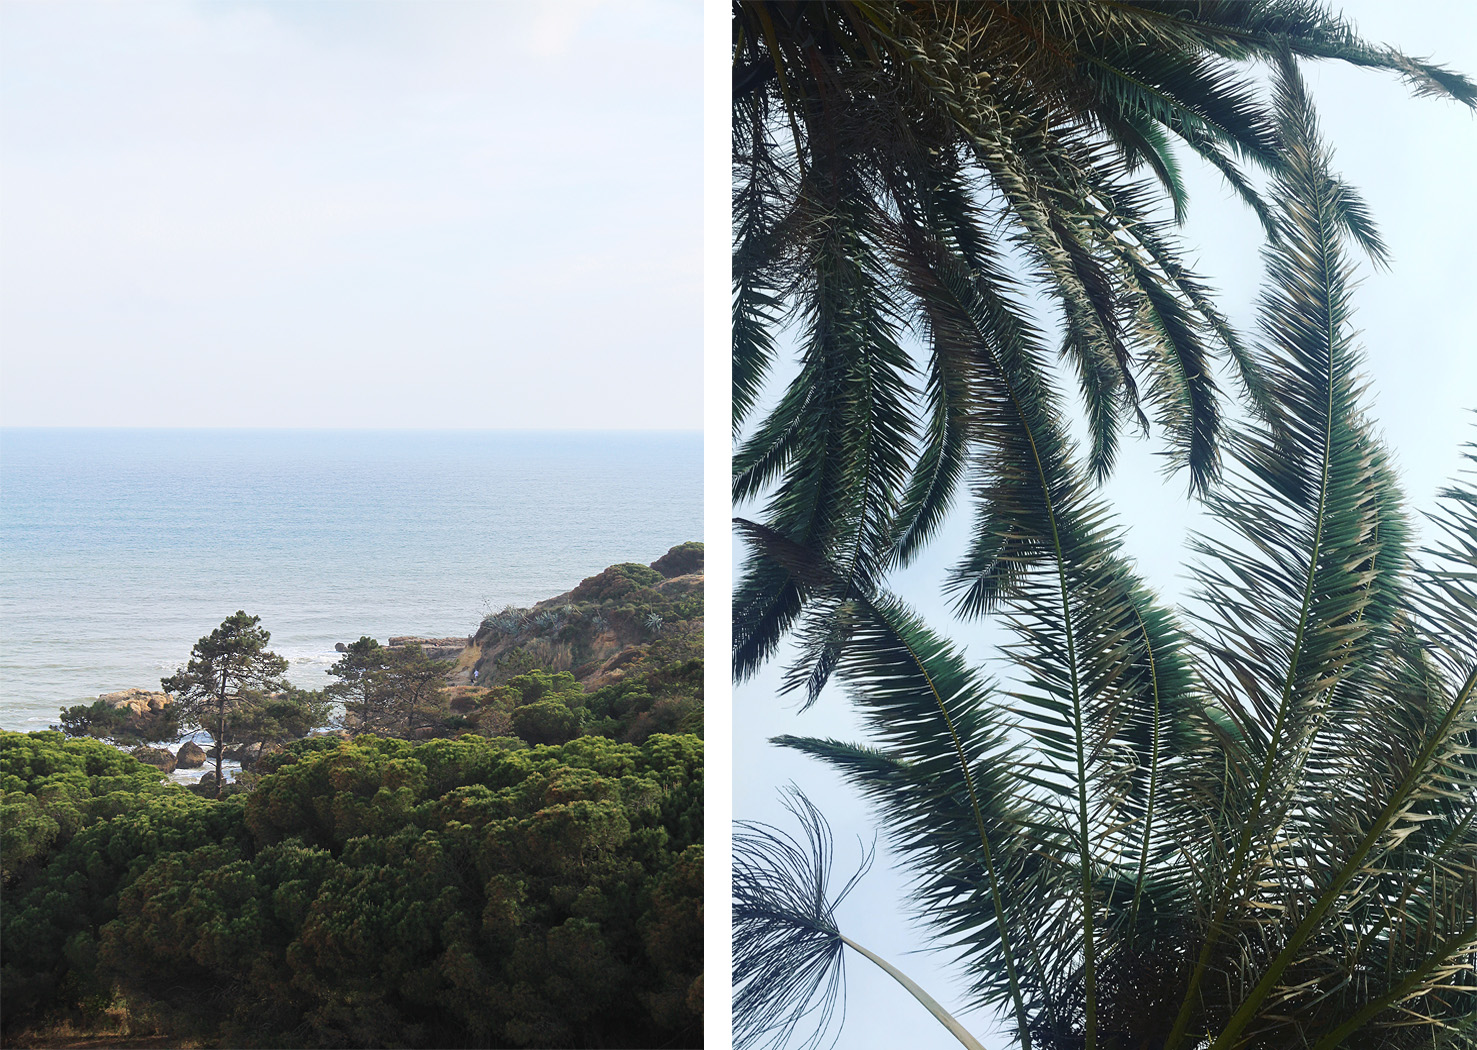 Sea views in Albufeira